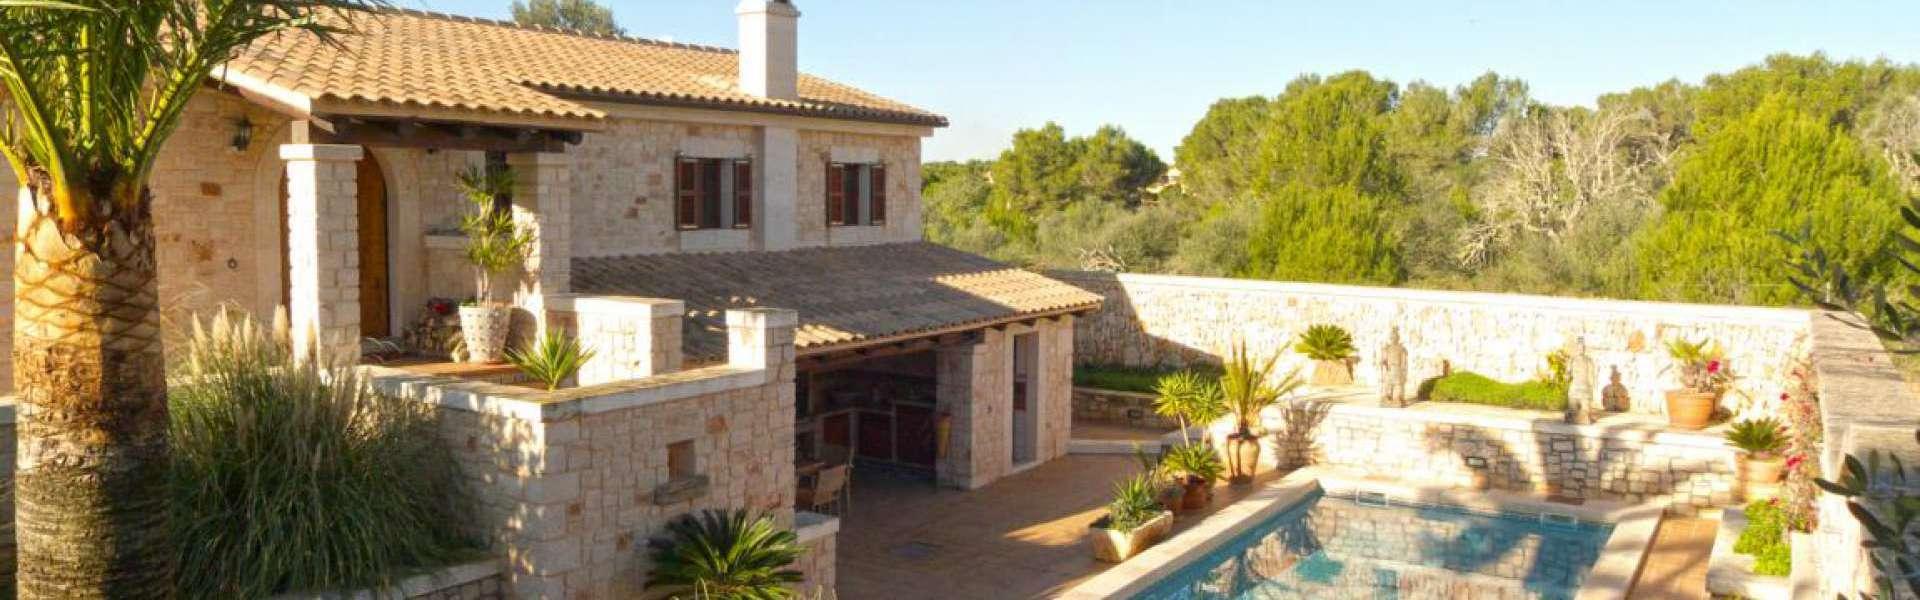 Cala Santanyi - Charming finca property in beautiful location